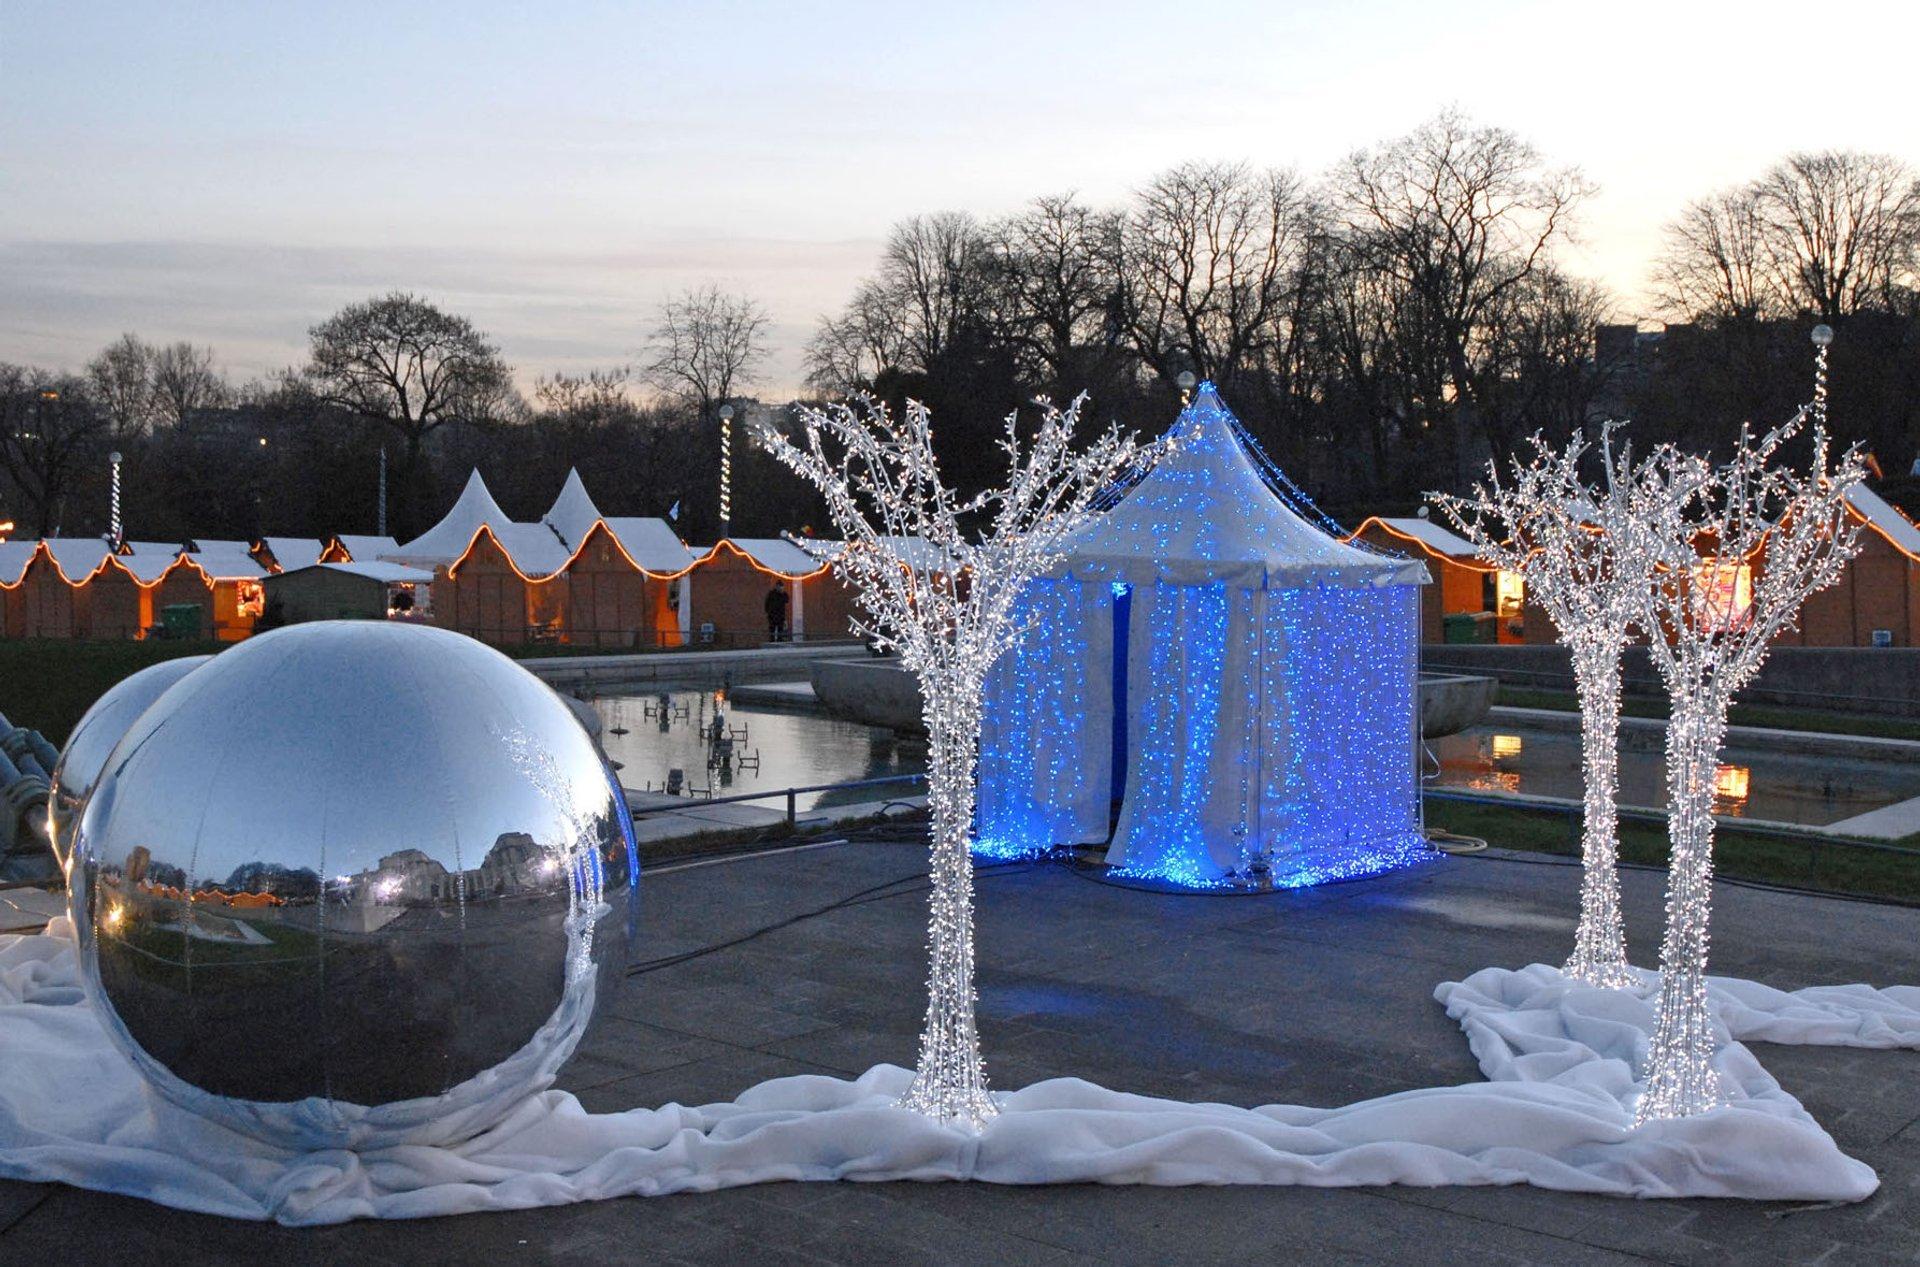 TrocadéRo On Christmas 2020 Christmas Markets 2020 2021 in Paris   Dates